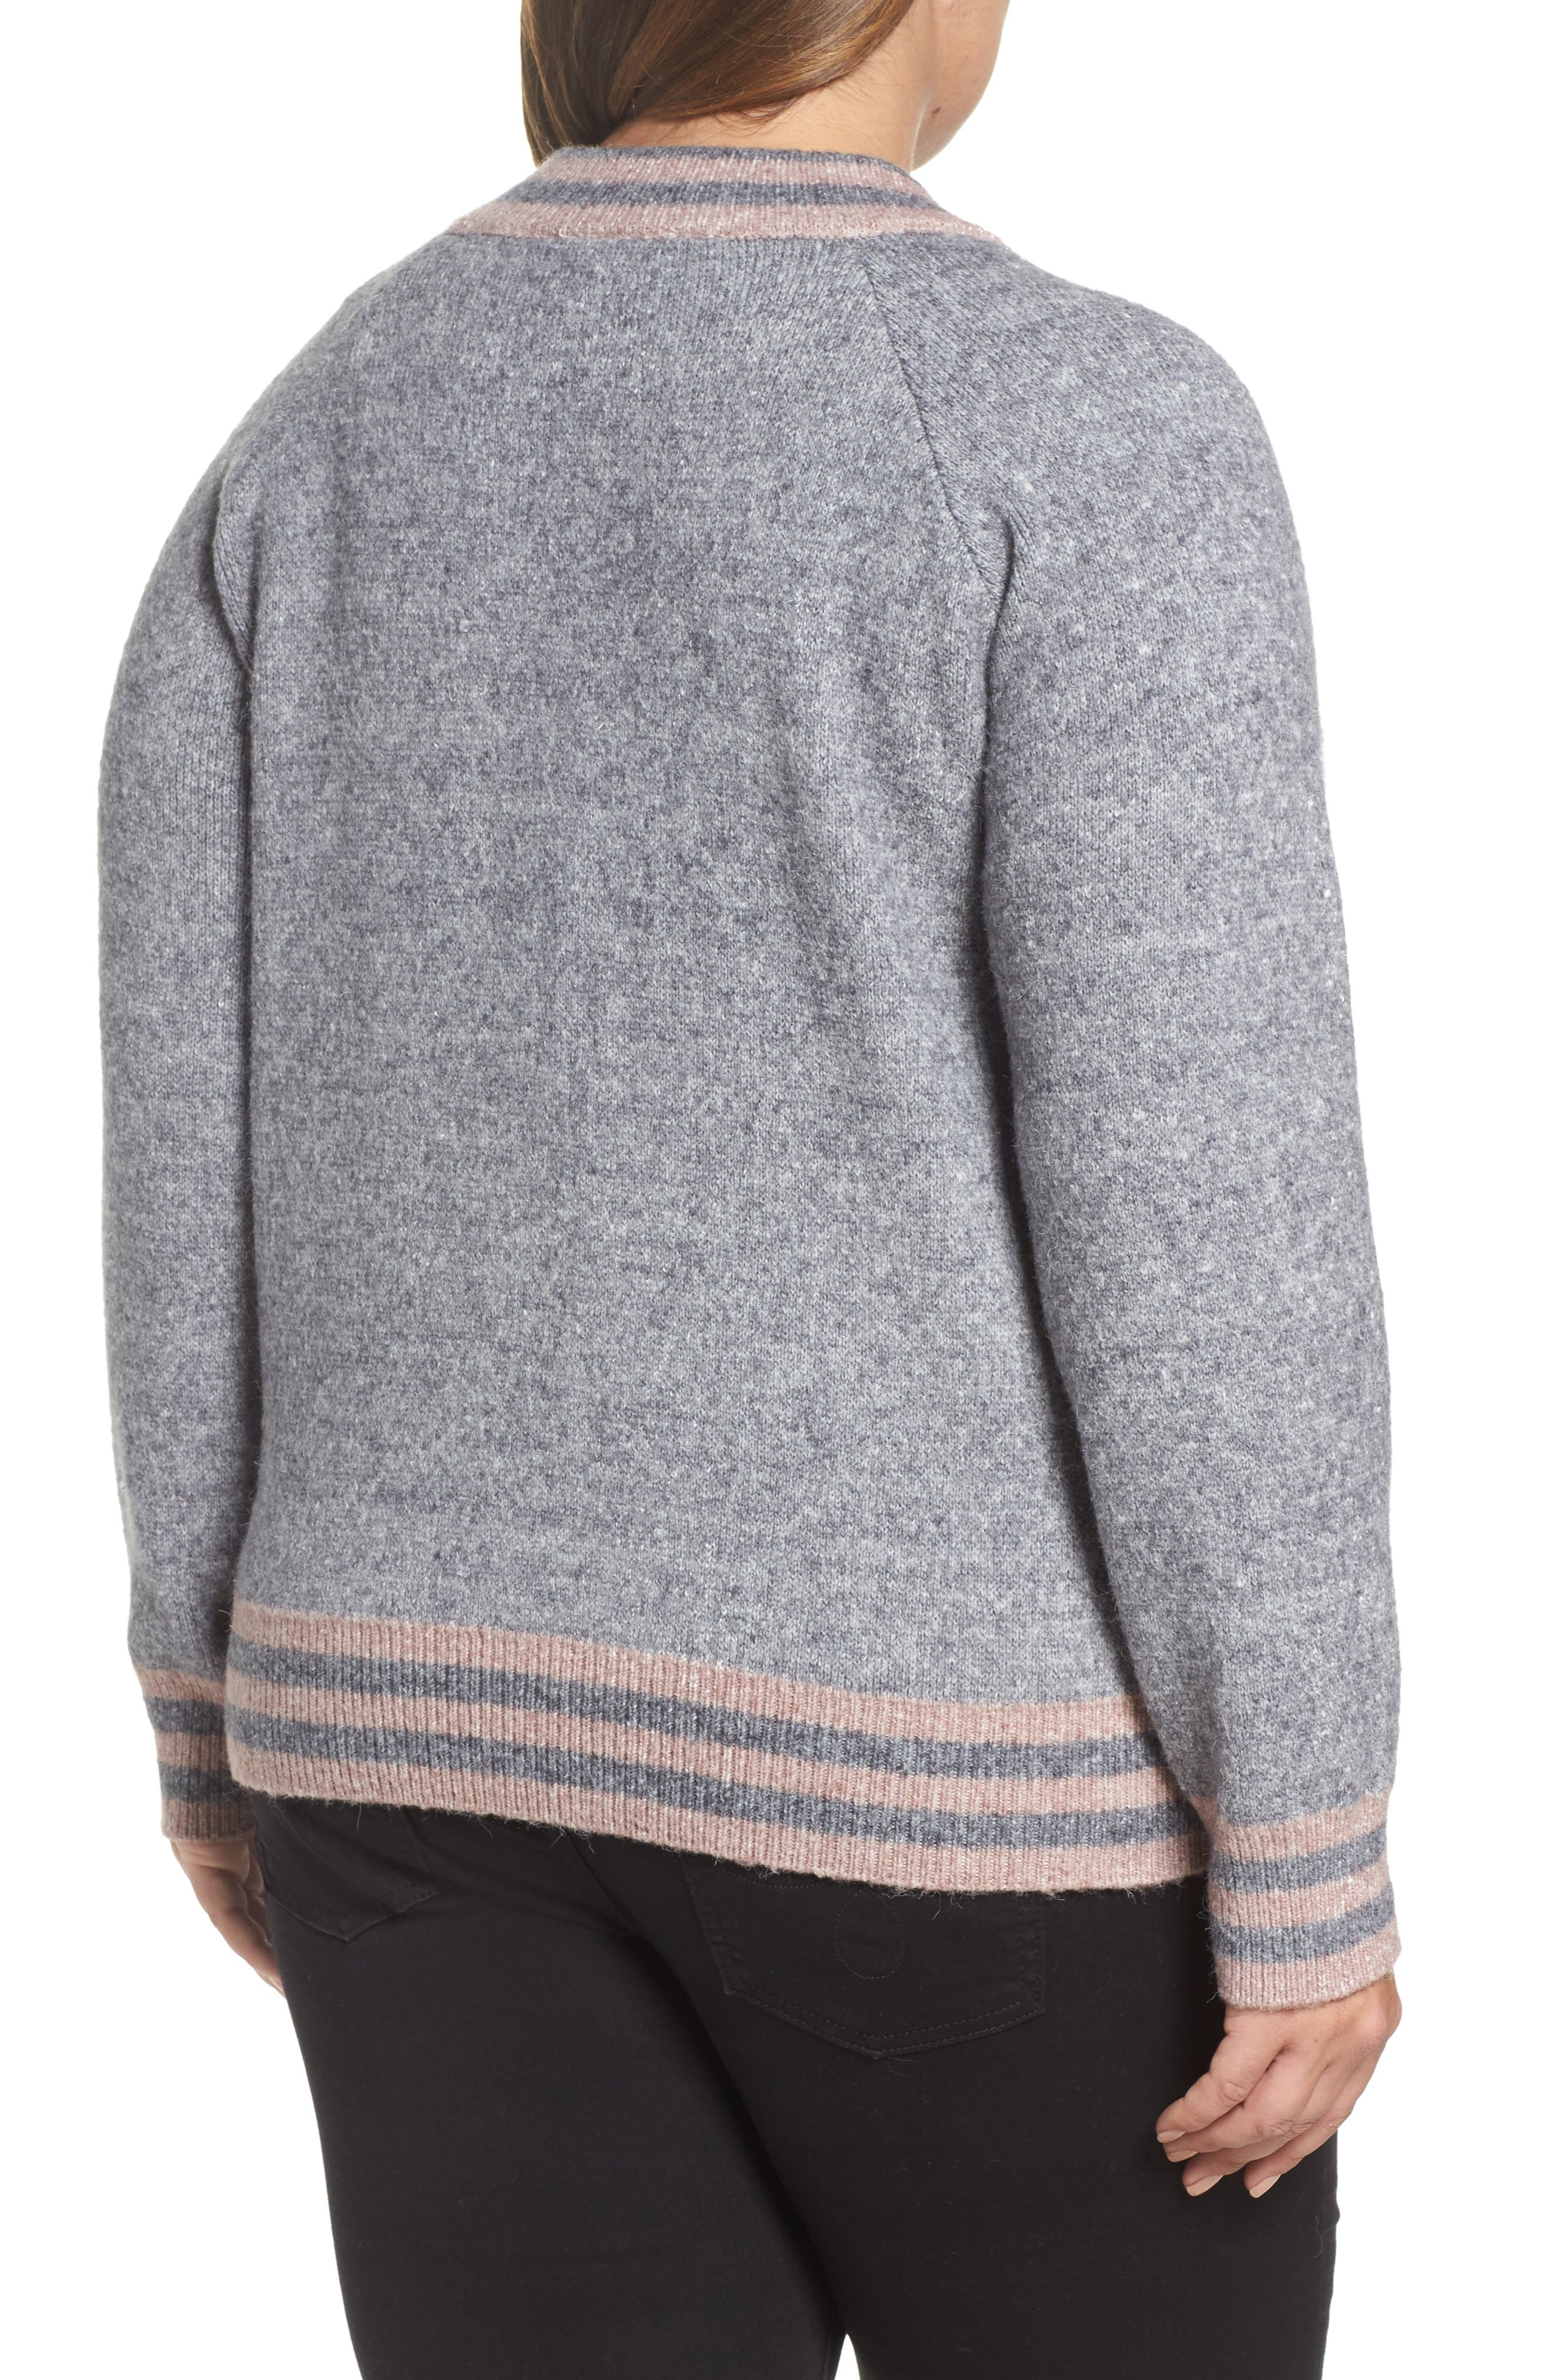 Zanja Embroidered Knit Bomber Jacket,                             Alternate thumbnail 2, color,